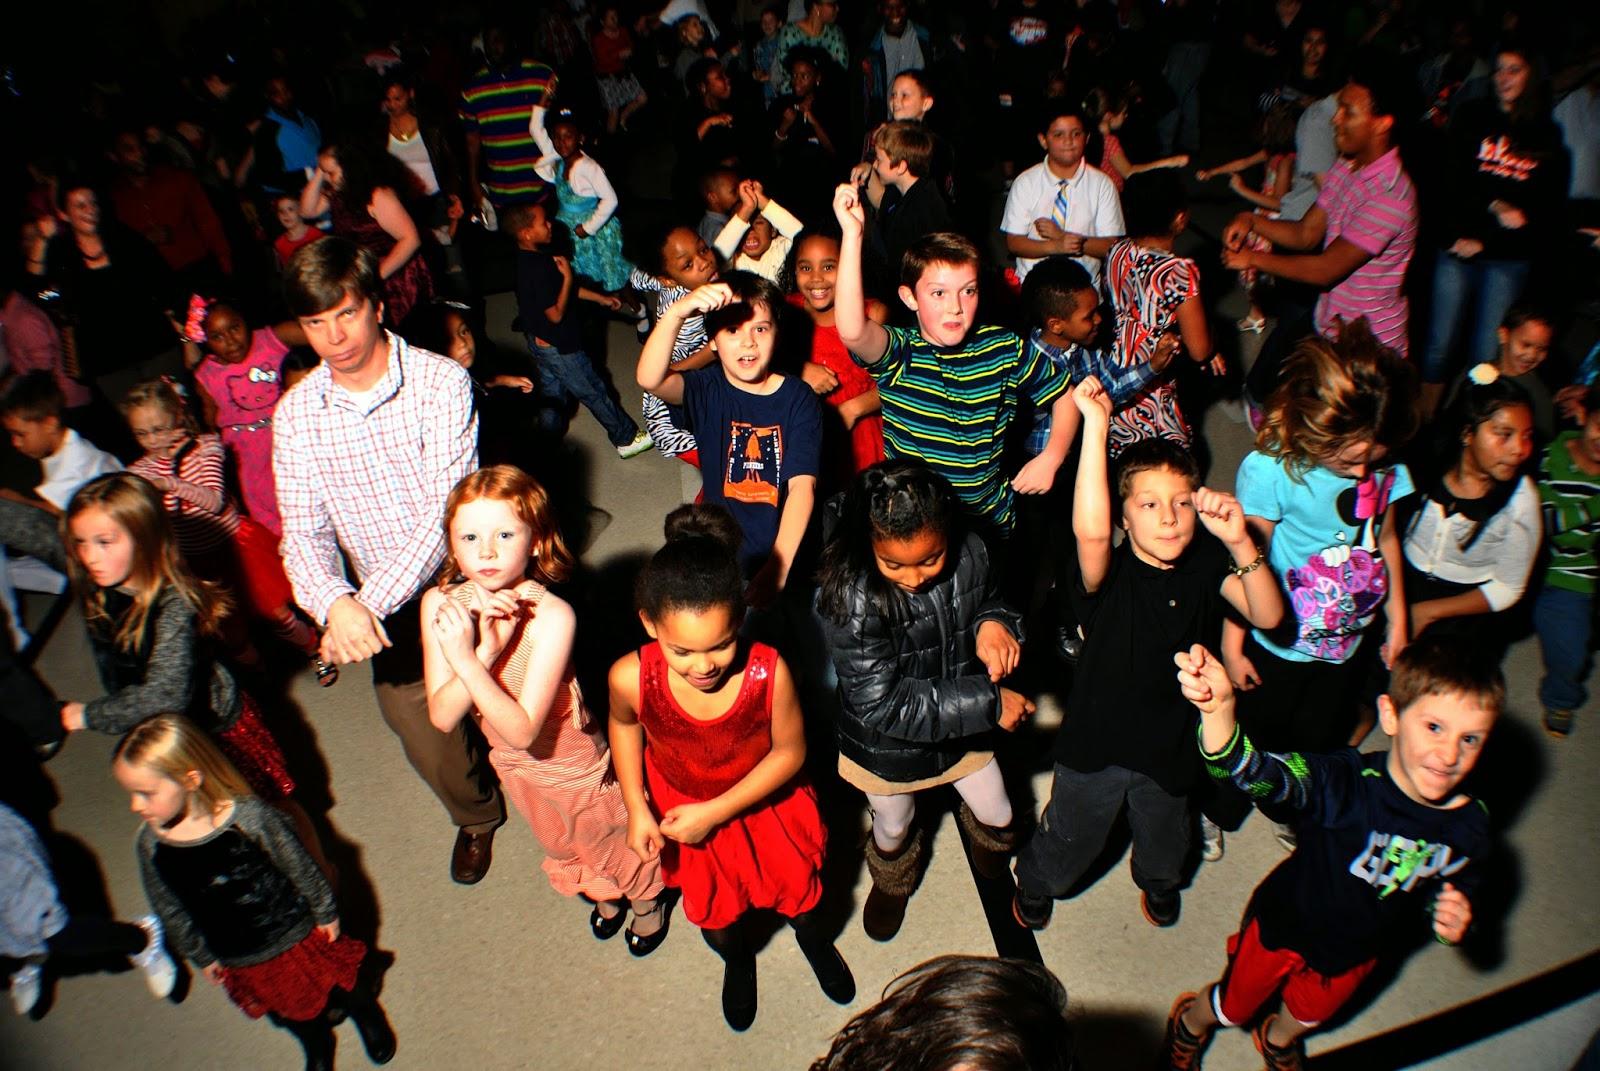 With Class LLC Wedding Coordinators, Wedding Planners, Wedding DJs, Party DJs, Chattanooga DJs, Cleveland DJs, Dalton DJs – East Ridge Elementary School – East Ridge, TN